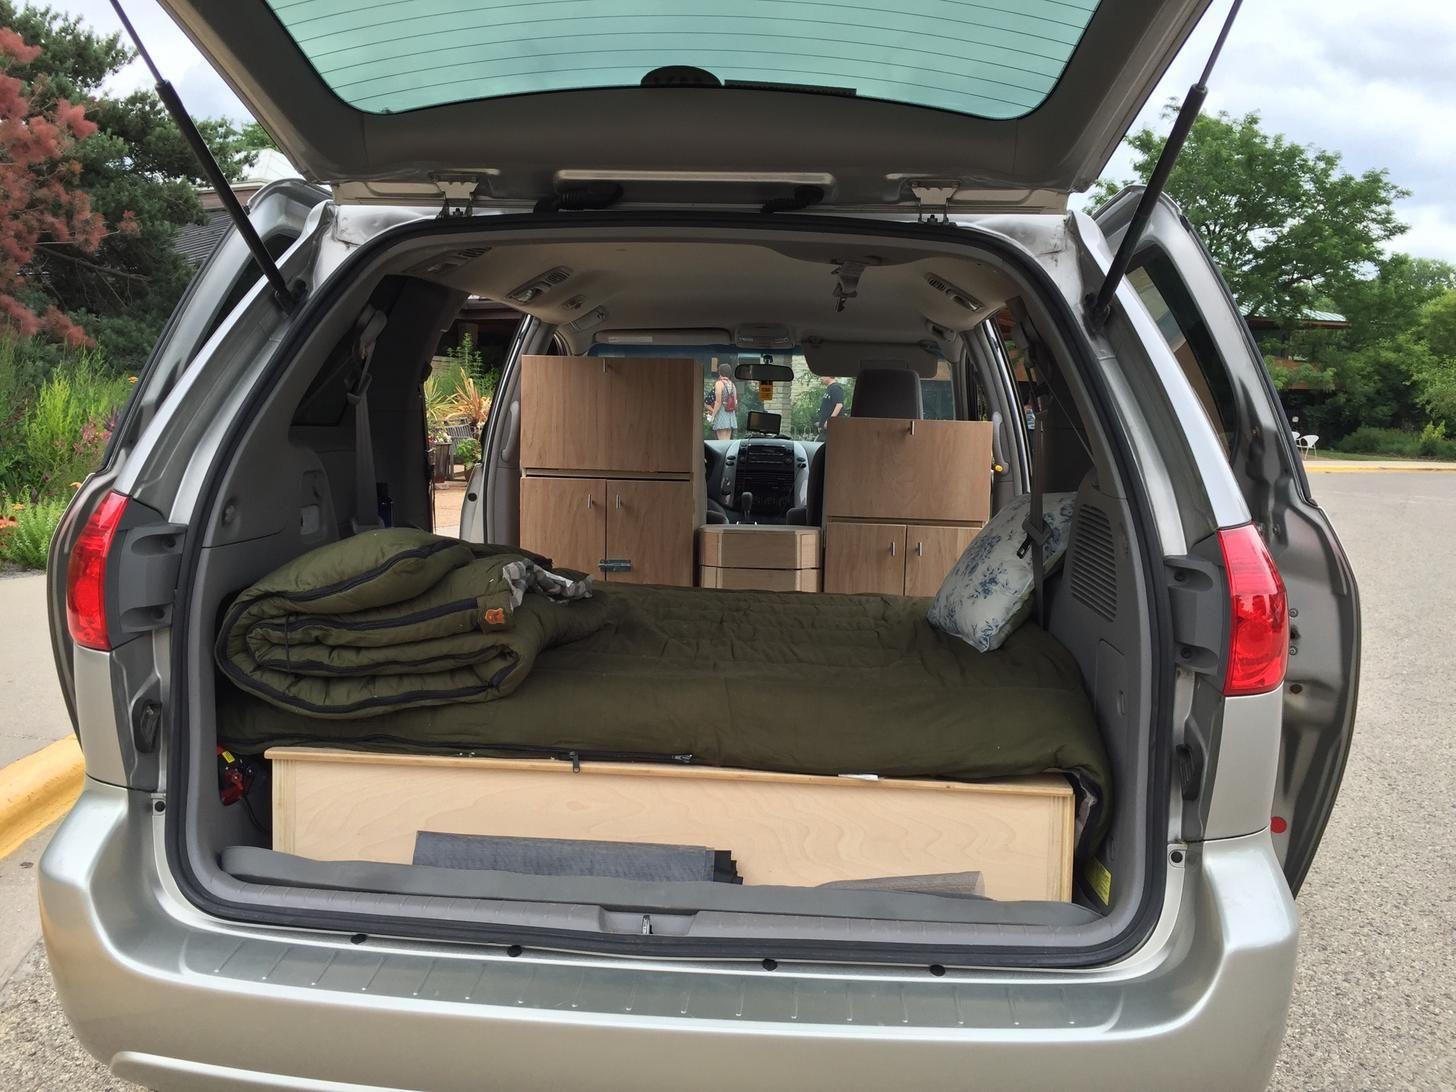 Toyota Sienna Mini Camper Van Car Camping Pinterest